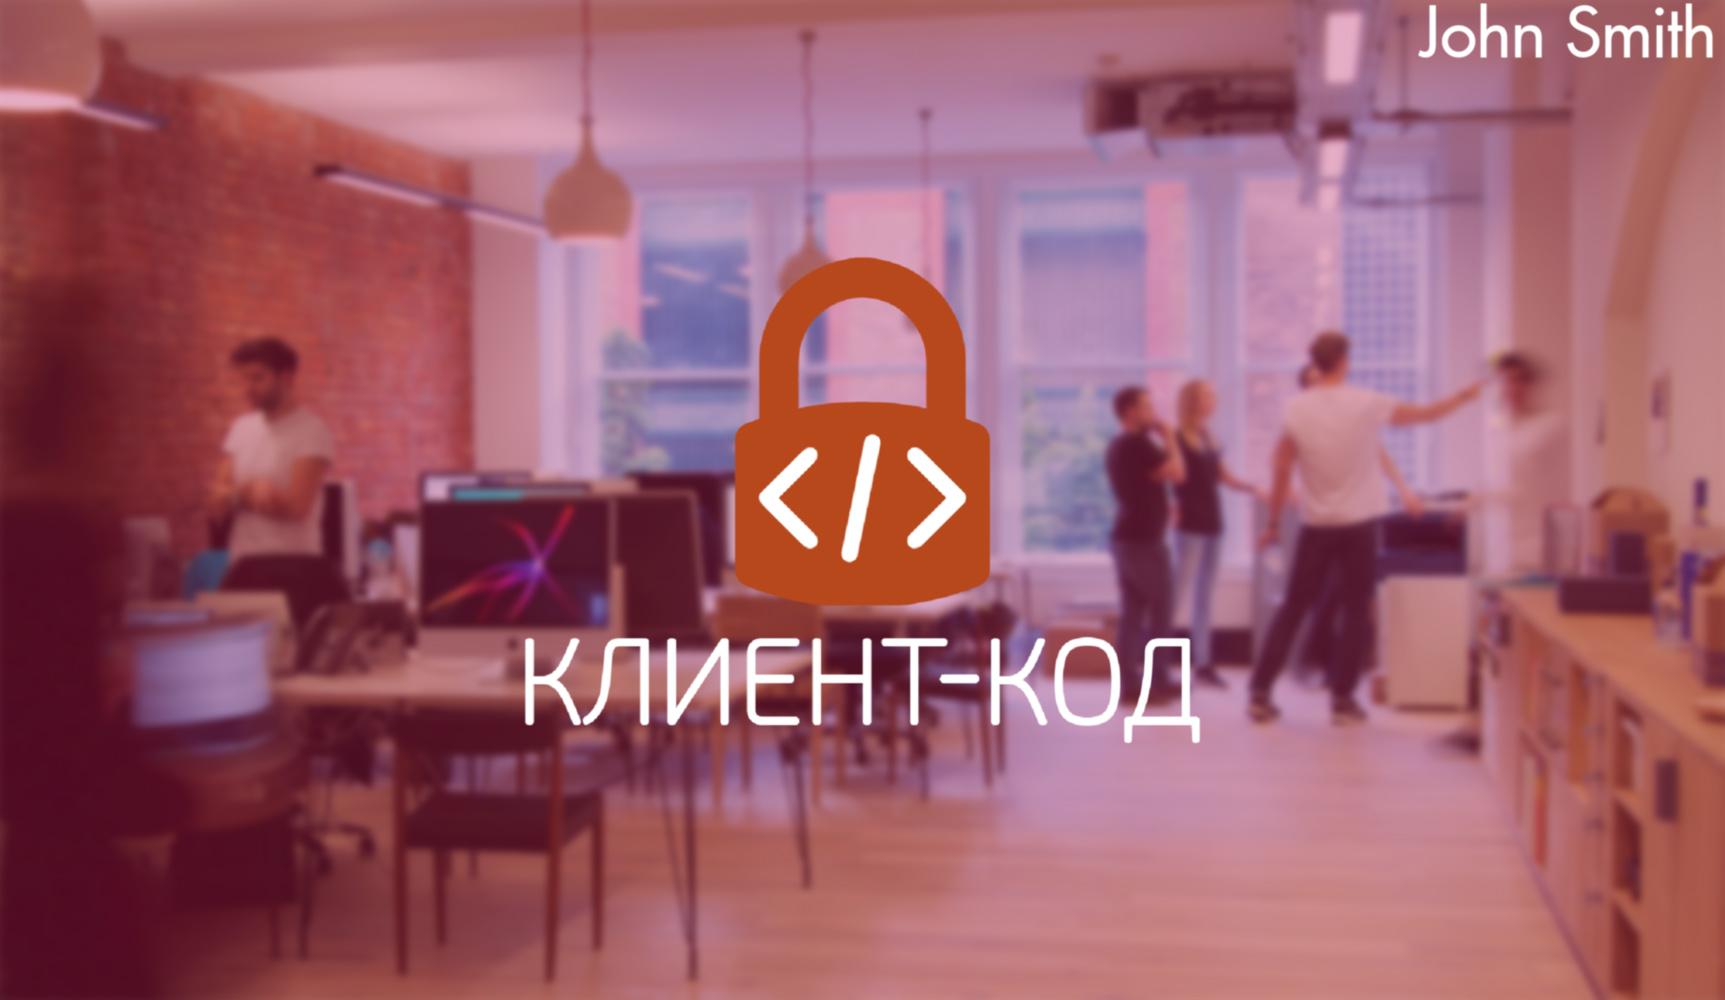 Нейминг и логотип компании, занимающейся аутсорсингом фото f_59859d68afc858b3.jpg